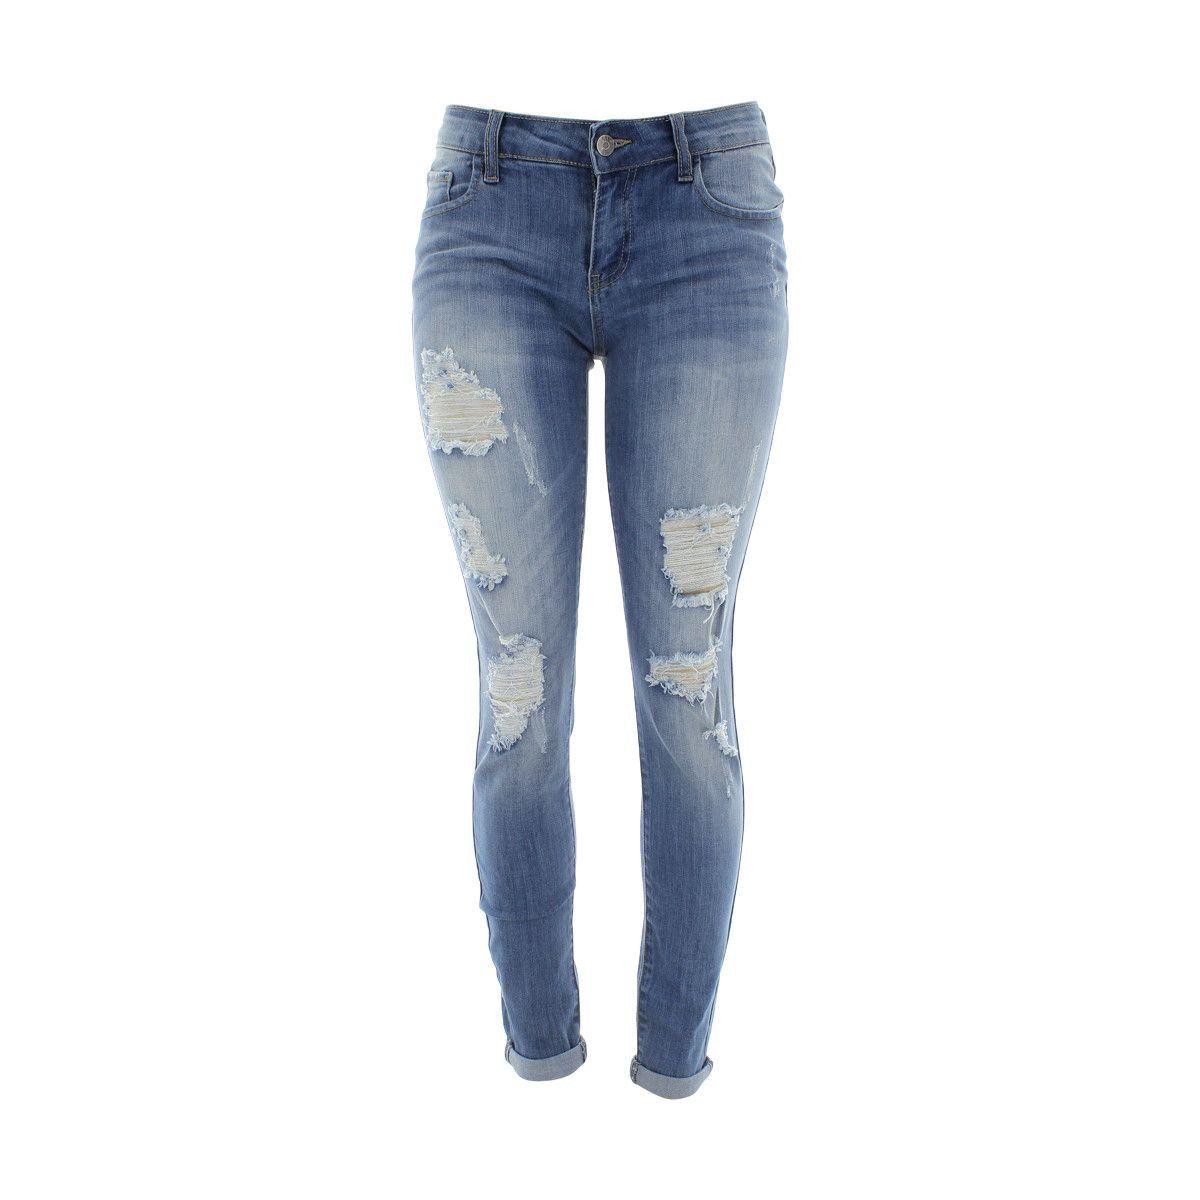 Cello Jeans - Women's Rips Roll Cuff Skinny Jeans - Light Blue ...